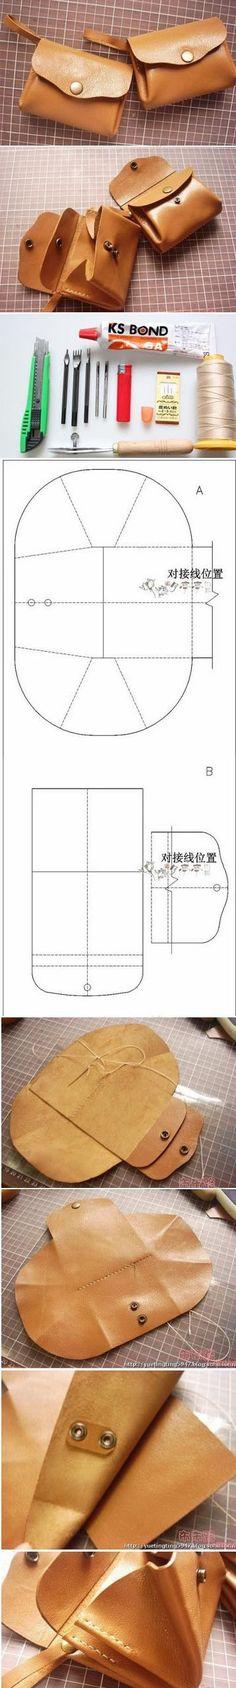 DIY: Interesting Easy Craft Ideas